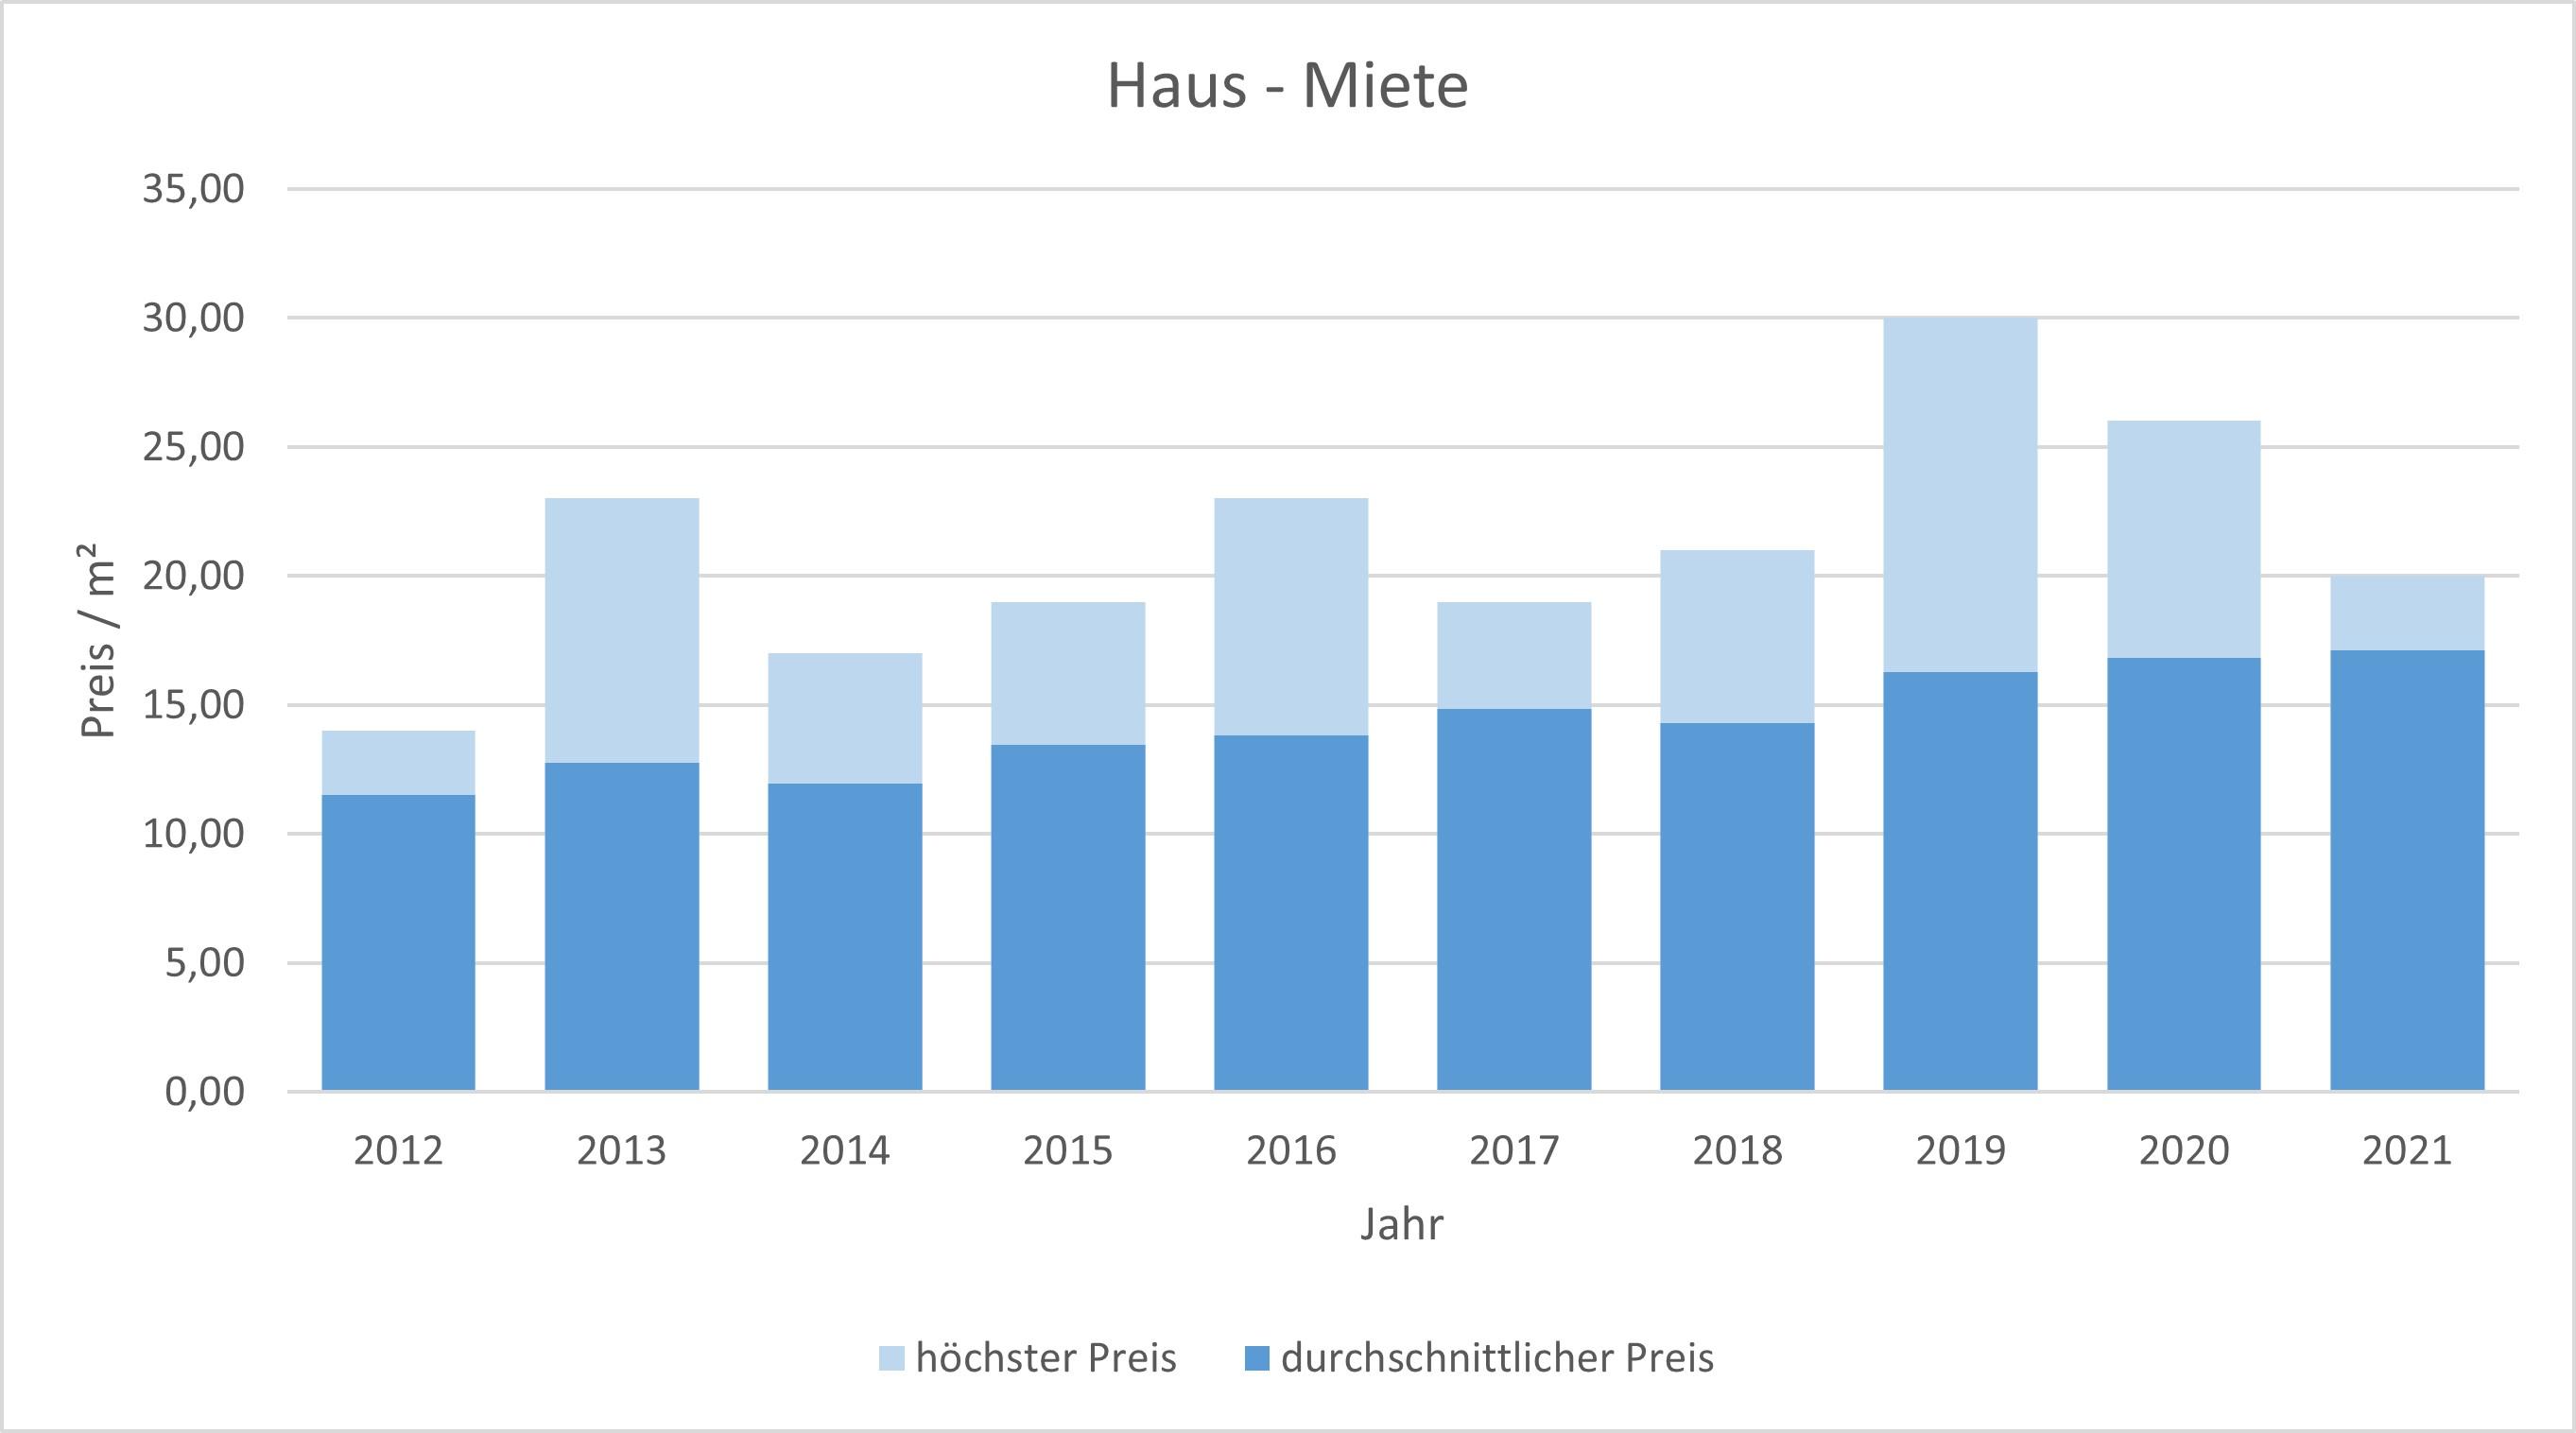 München - Aubing Haus mieten vermieten Preis Bewertung Makler www.happy-immo.de 2019 2020 2021